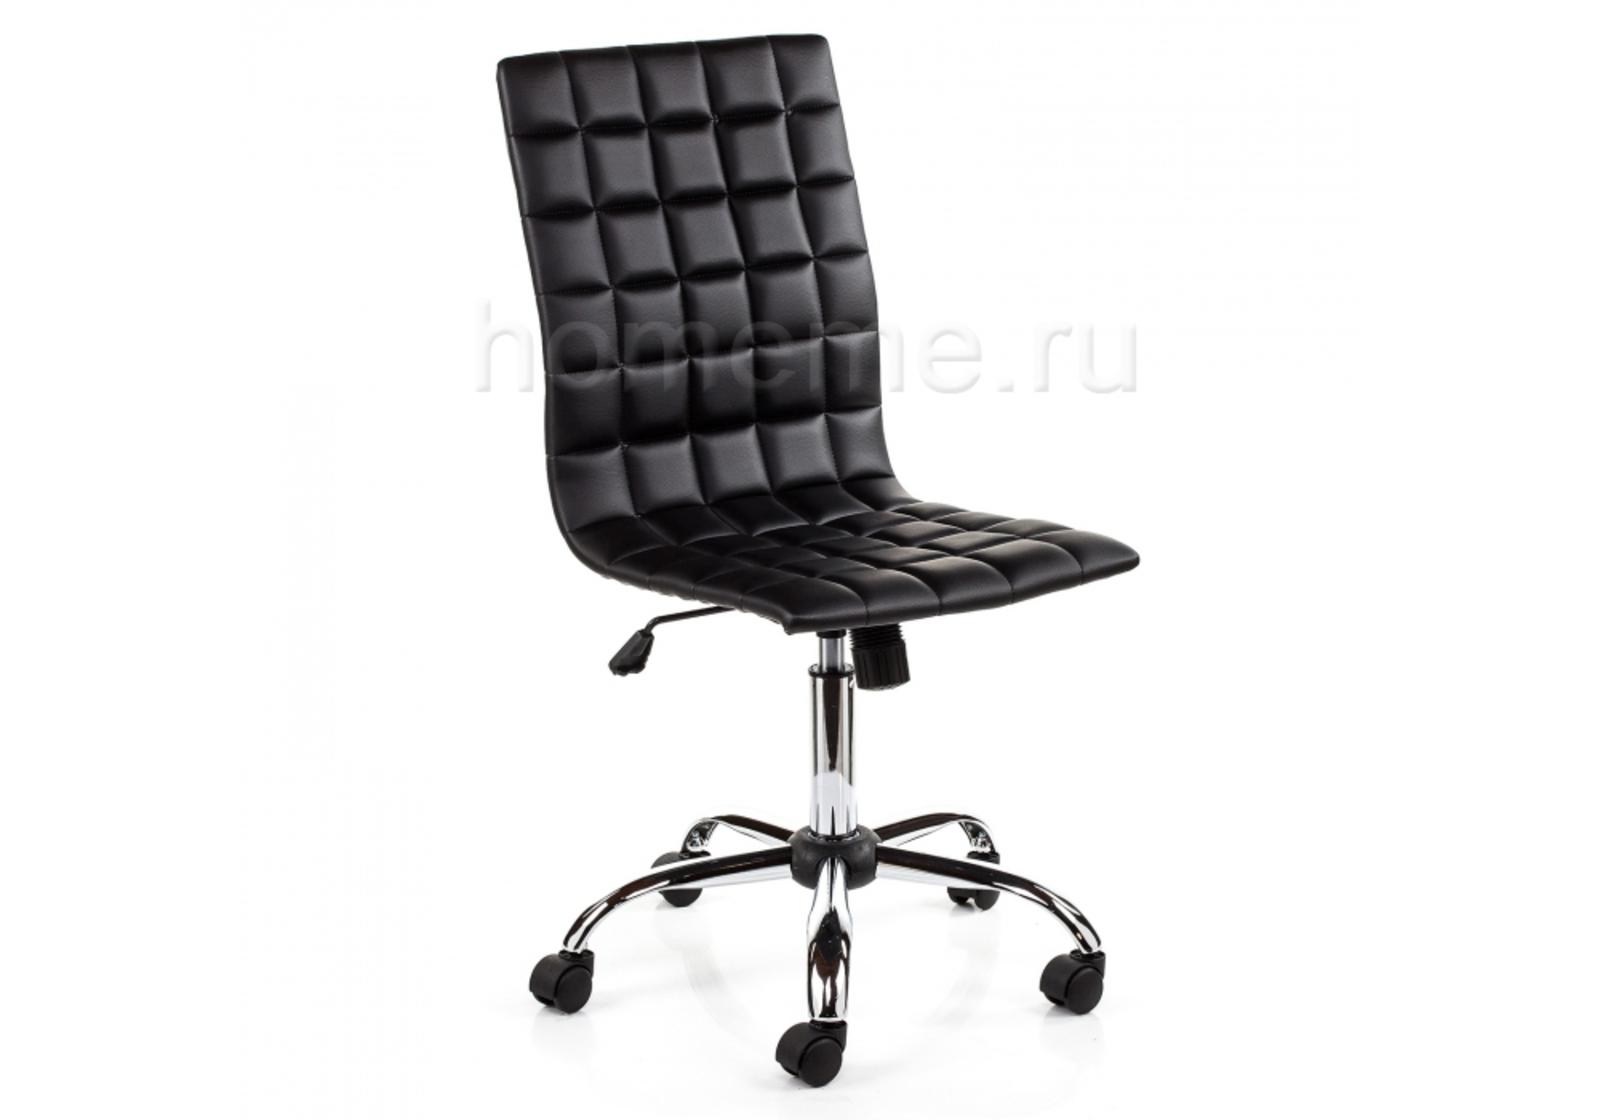 Кресло для офиса HomeMe Strong черный 1557 от Homeme.ru